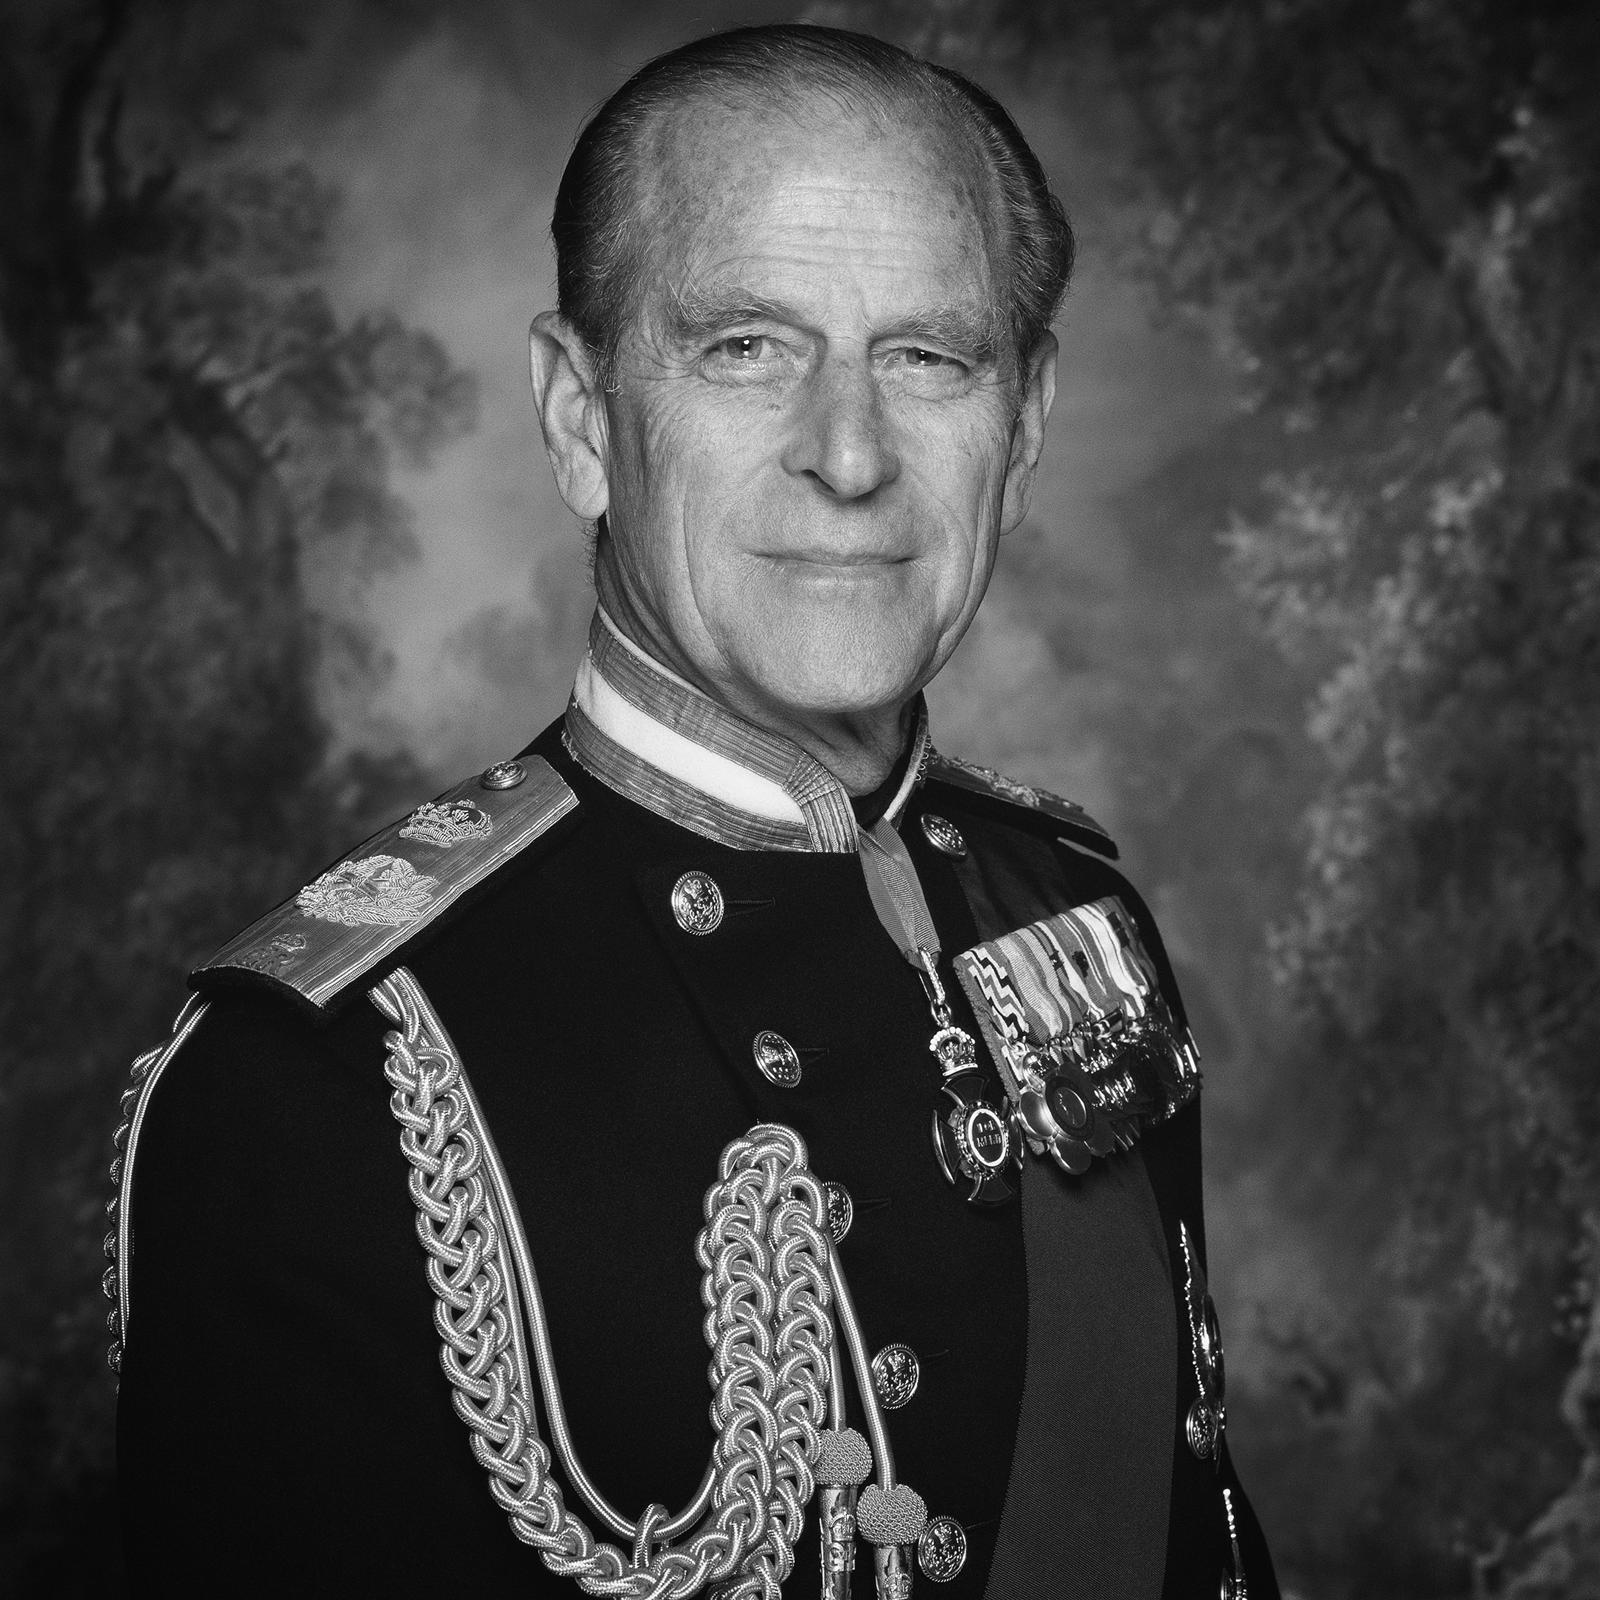 Prince Philip official portrait courtesy Buckingham Palace